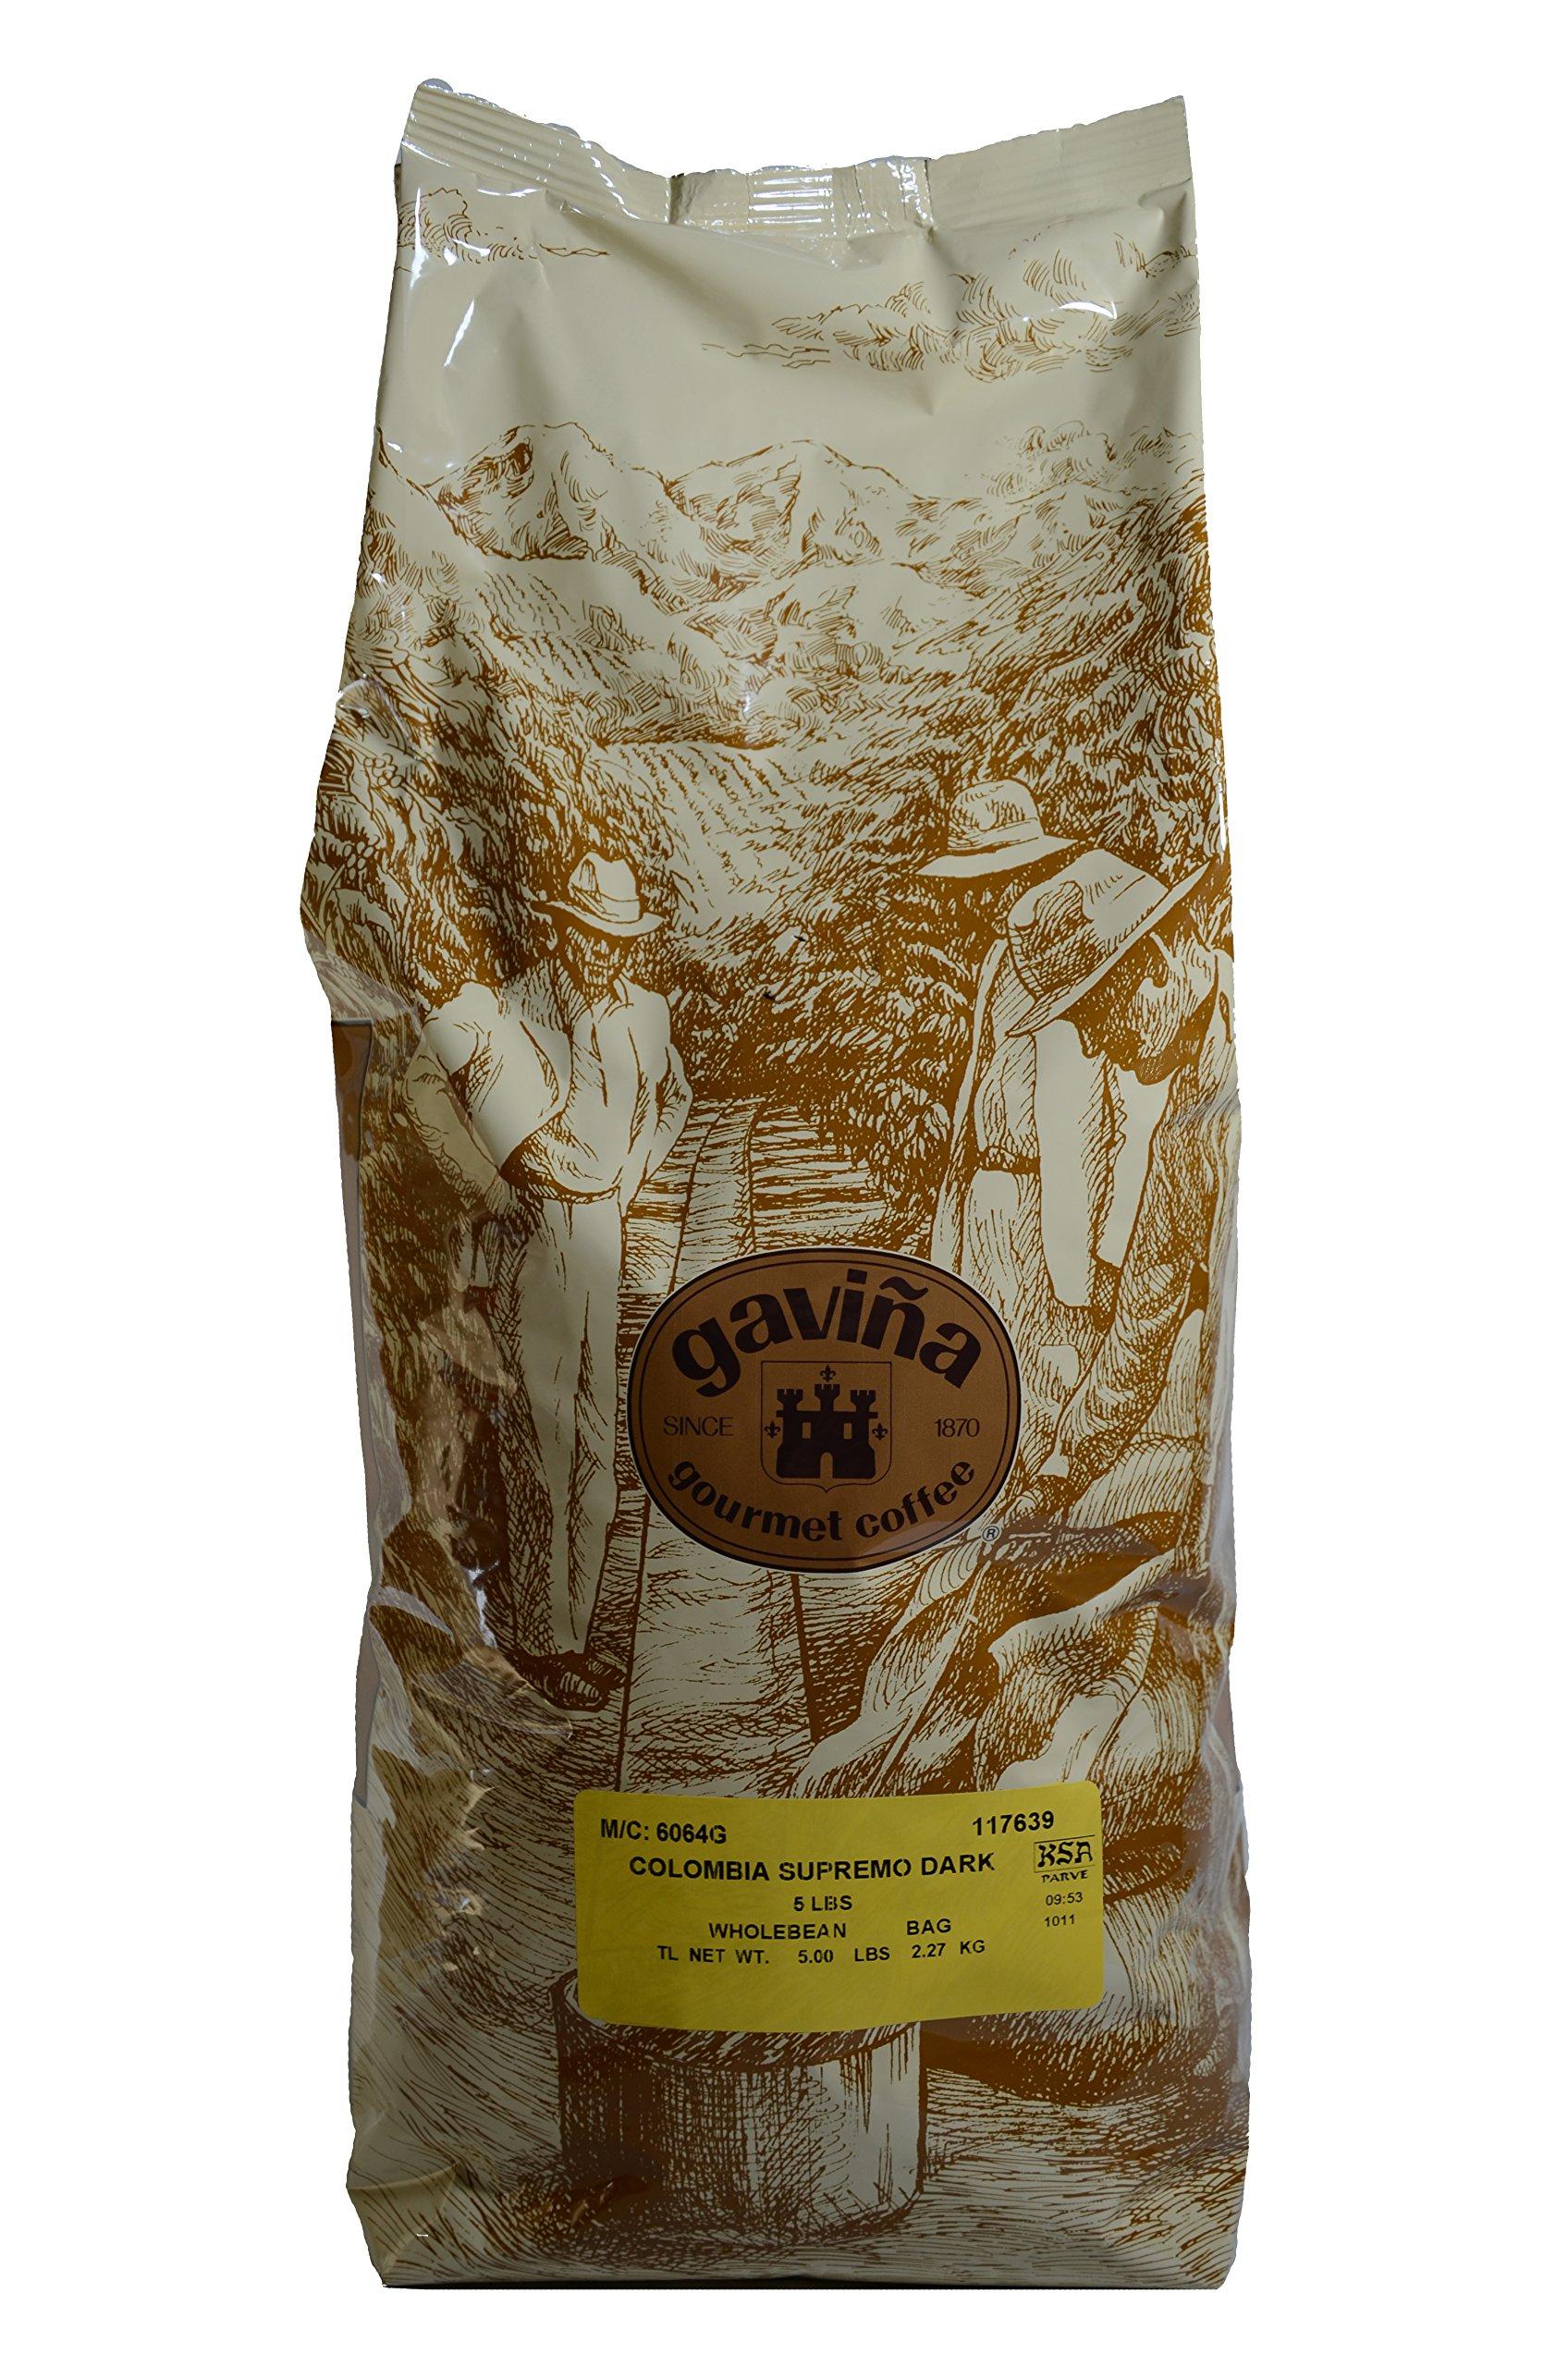 Gavina Colombian Supreme Dark Wholebean Coffee 1 (5) lb Bag #428